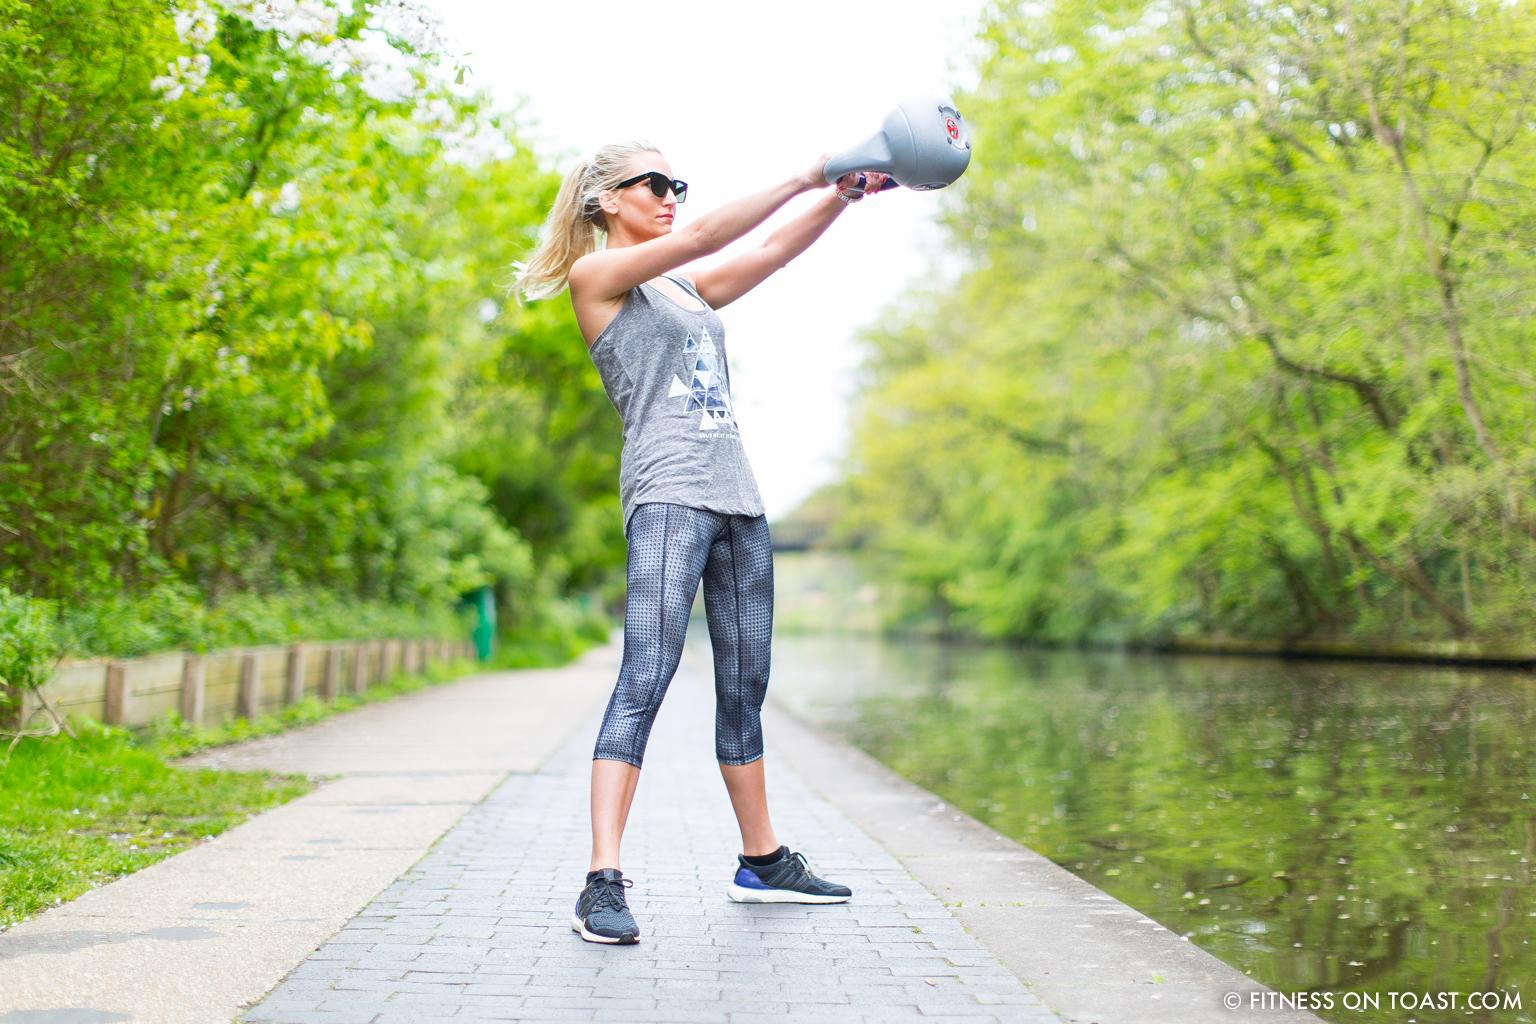 Fitness On Toast Faya Blog Girl Healthy Workout Regents Canal London Kettle Bell Squat Swing Lunge Twist Burpees Old Navy Fashion OOTD Gap Chanel Celine-4